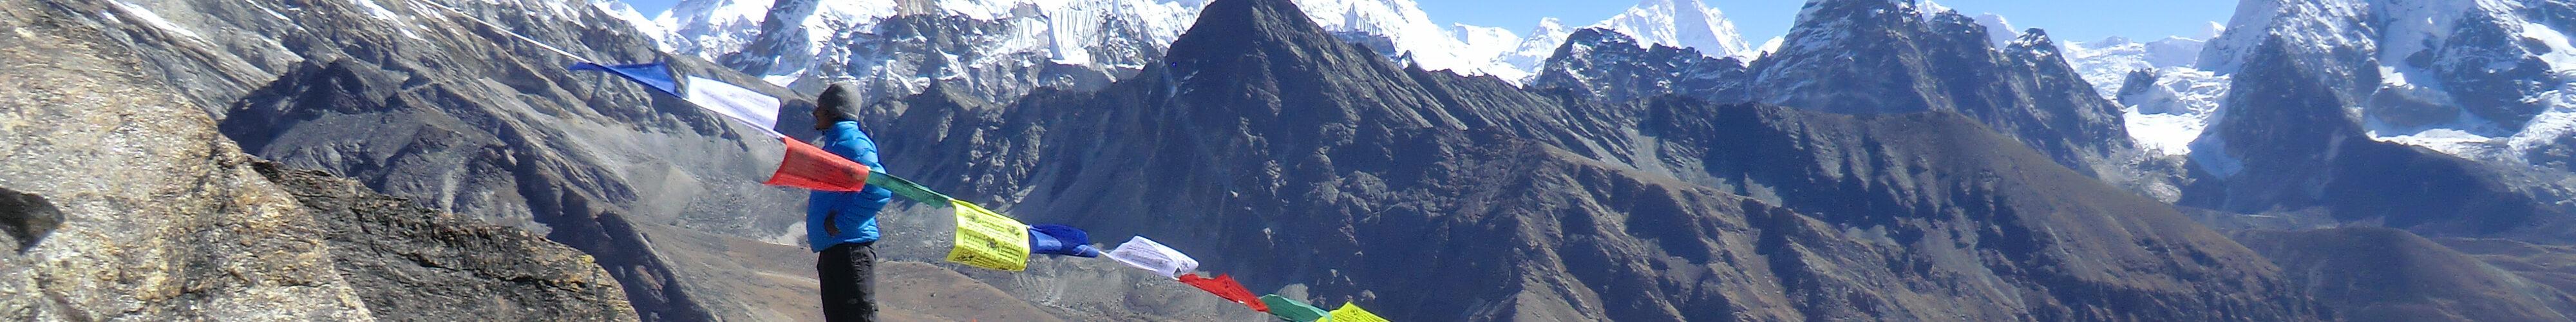 Mount Everest Kipling Travel